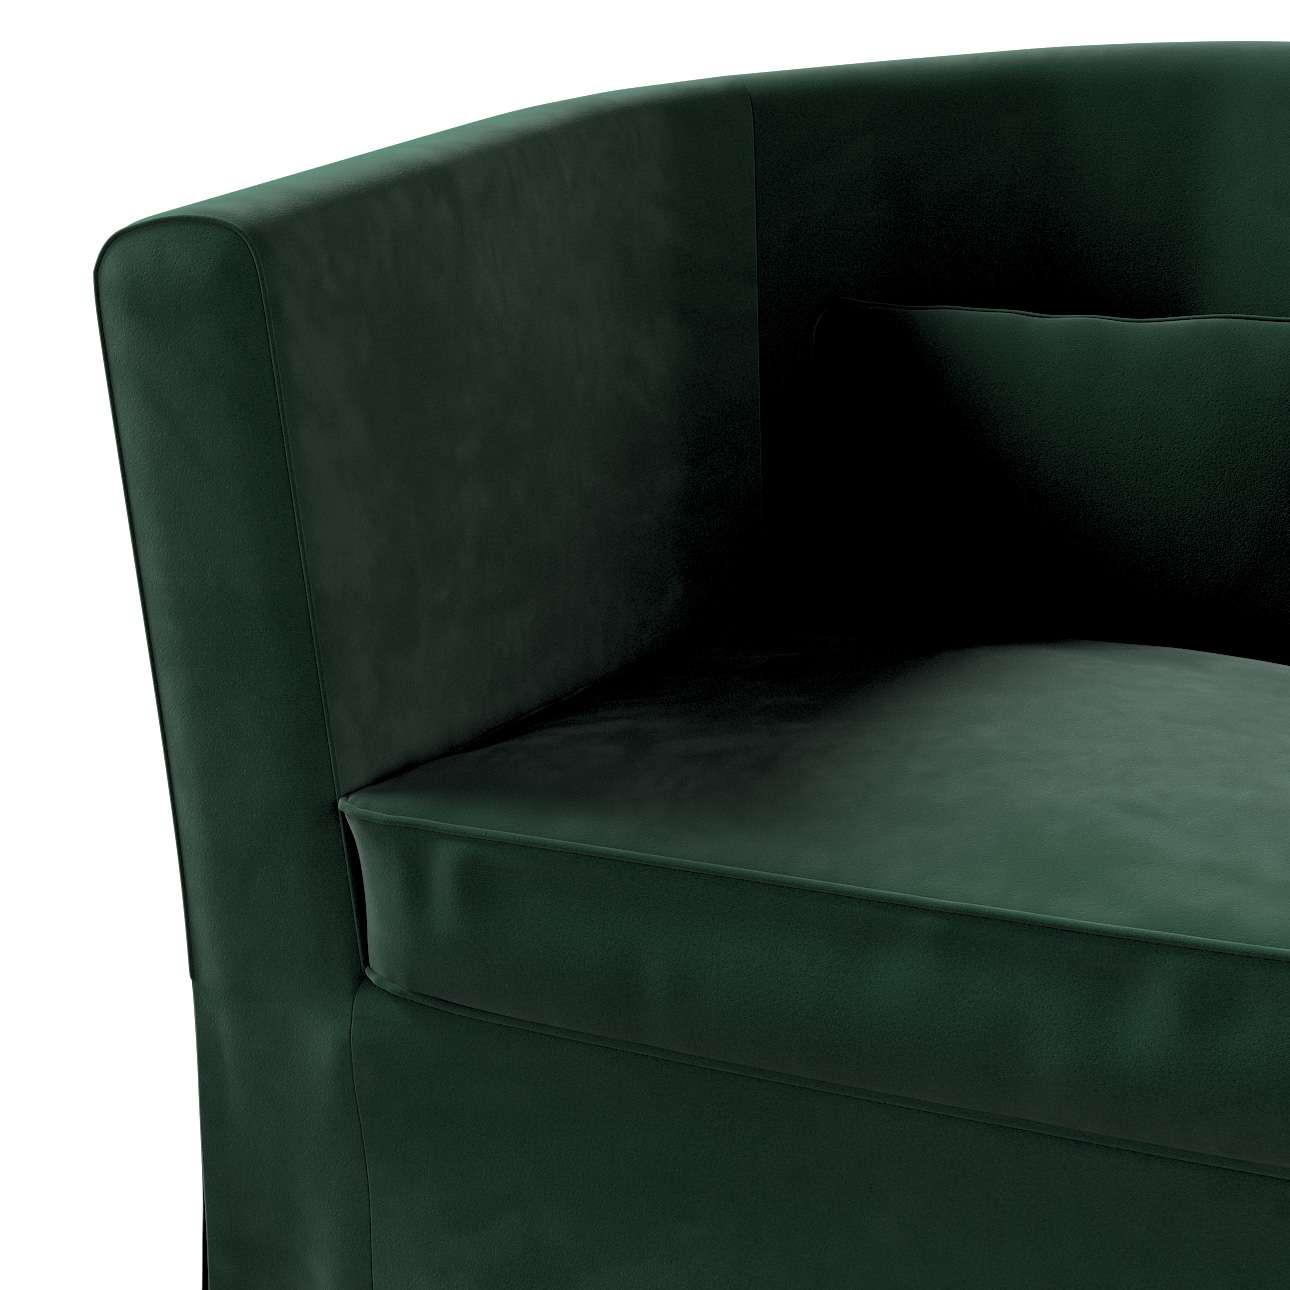 Pokrowiec na fotel Ektorp Tullsta w kolekcji Velvet, tkanina: 704-25